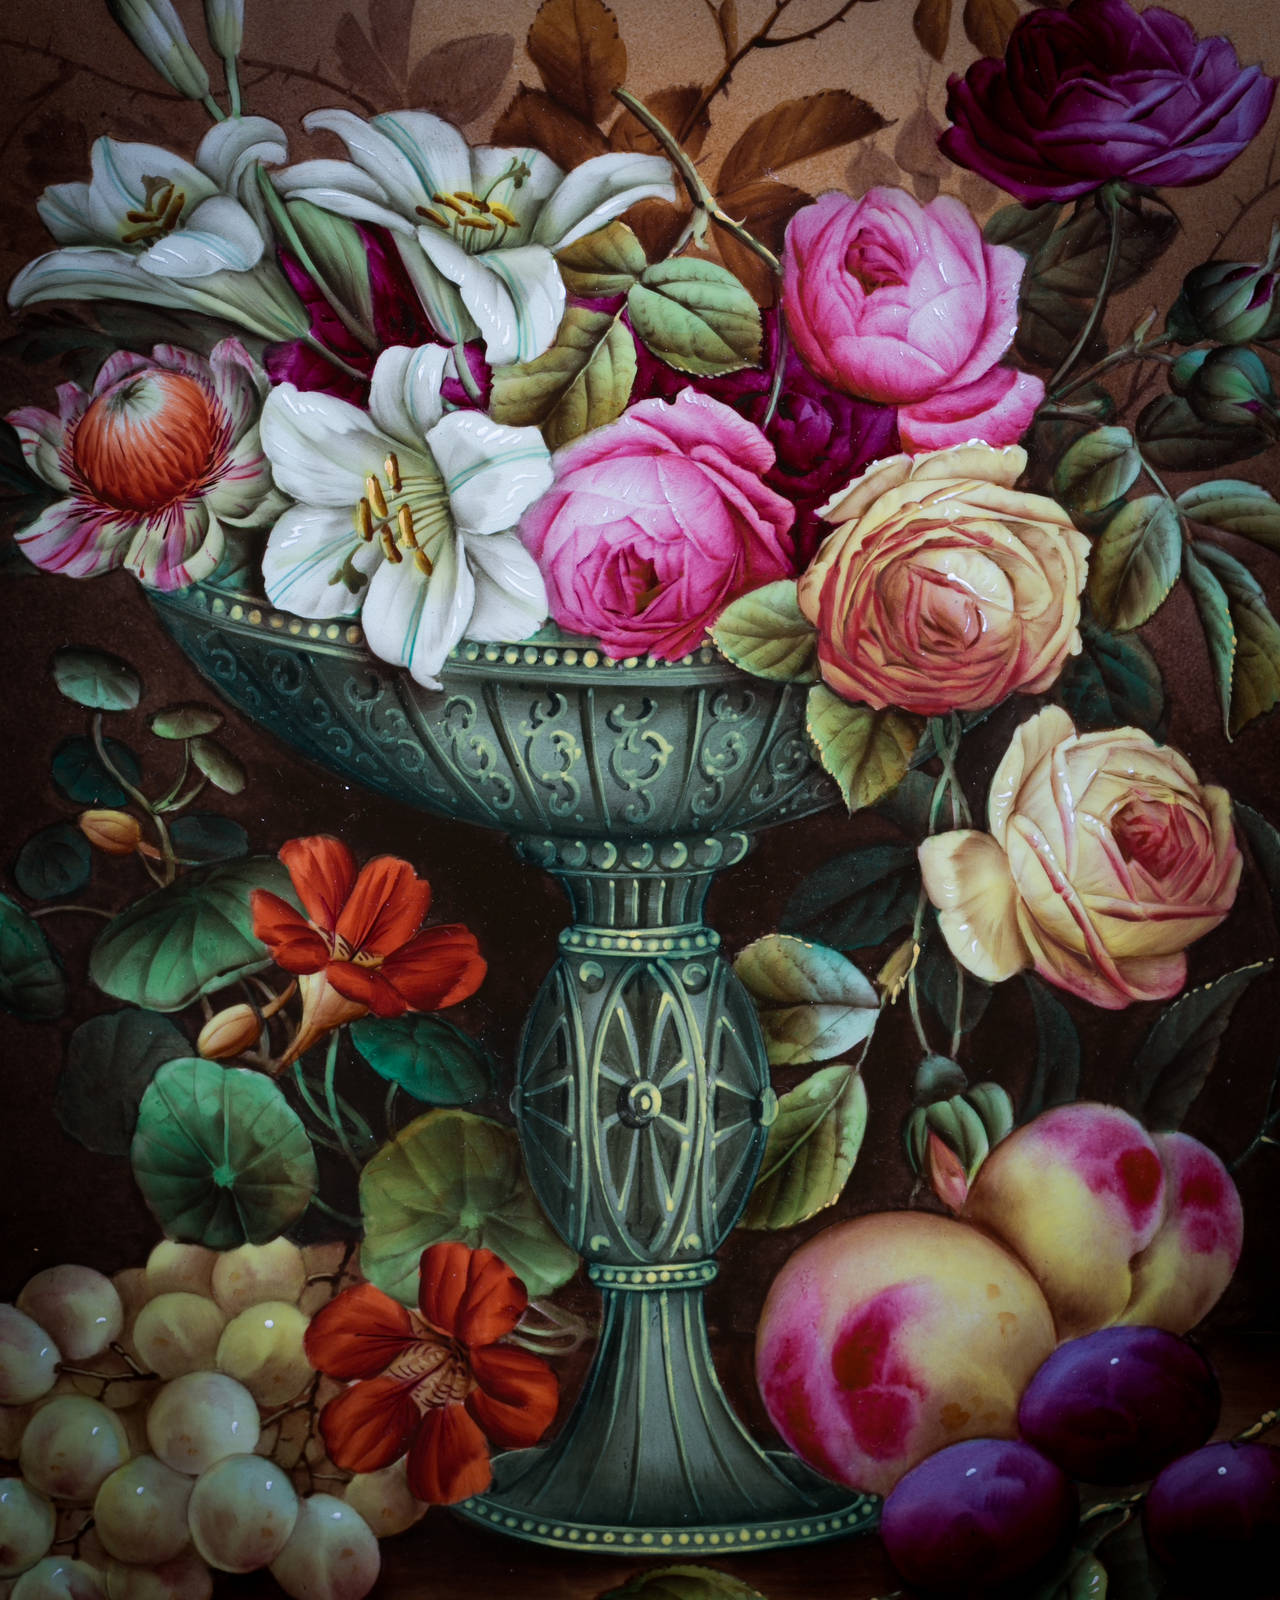 Framed English porcelain plaque, circa 1850. Signed artist Edwin Steele (son of Thomas).